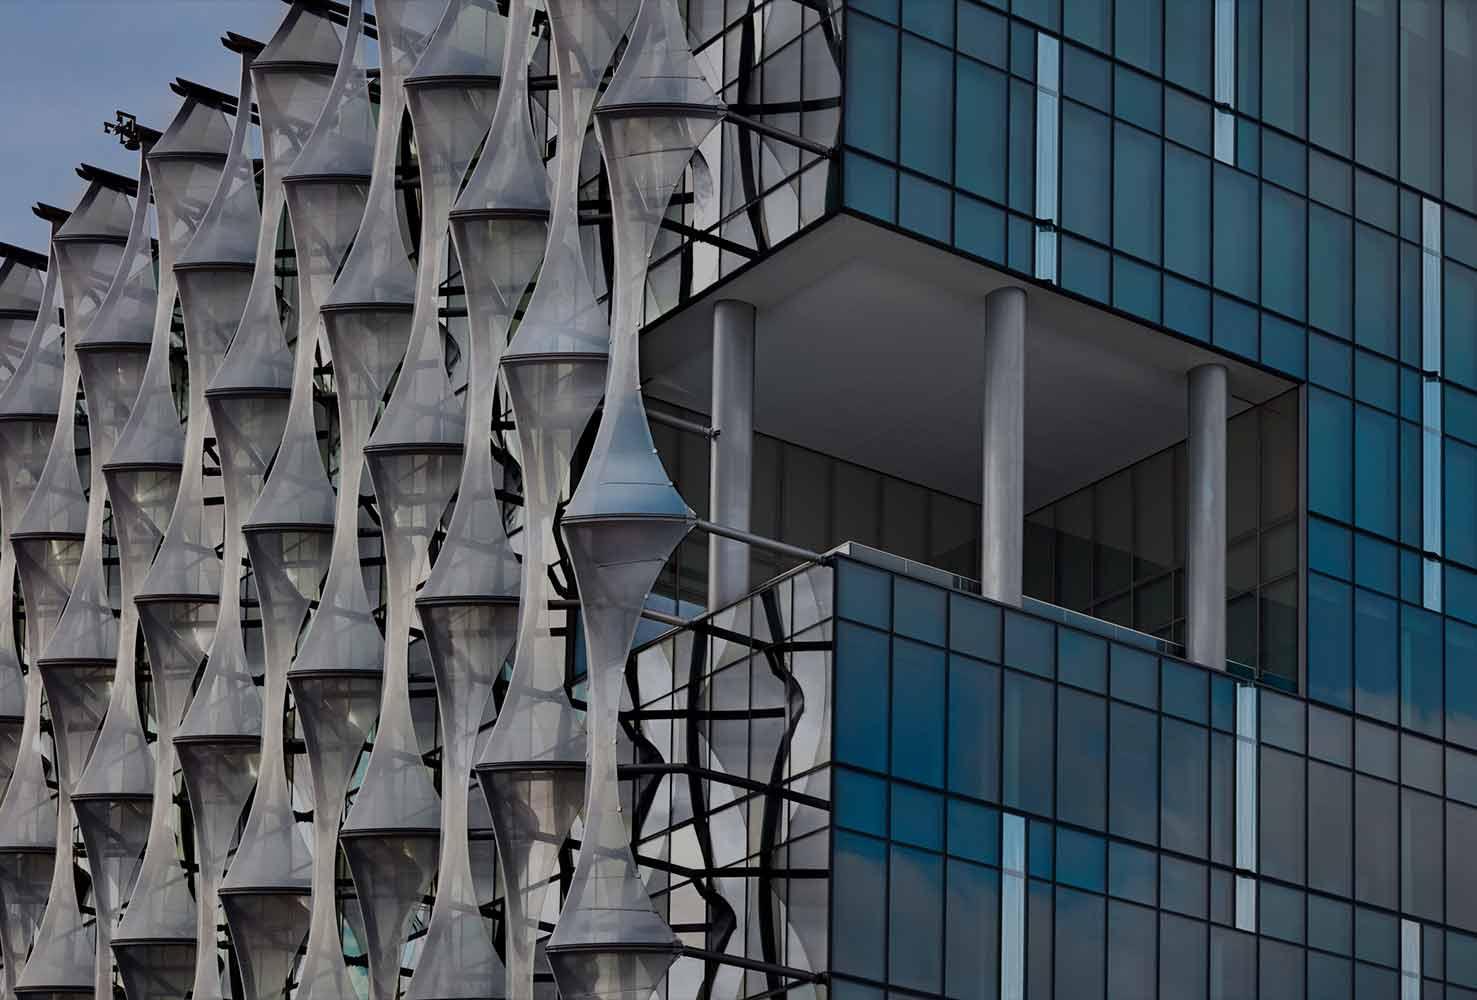 london-building-edited.jpg